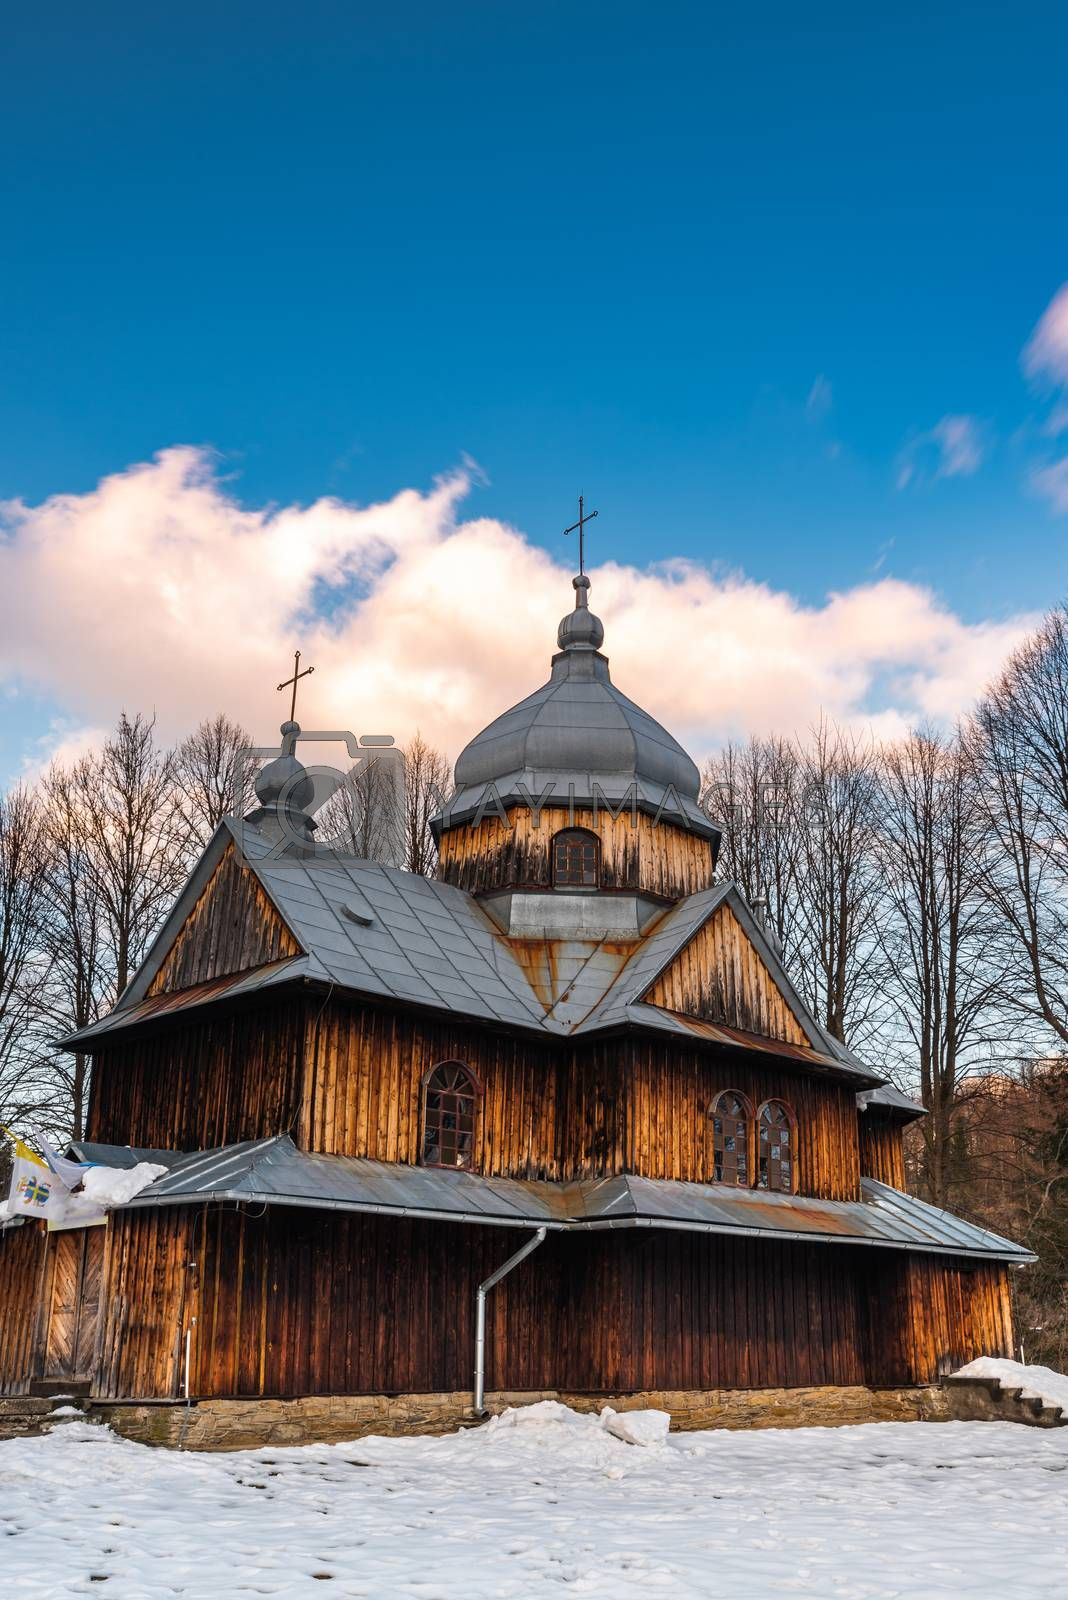 St. Nicholas Orthodox Church in Chmiel. Carpathian Mountains and by merc67